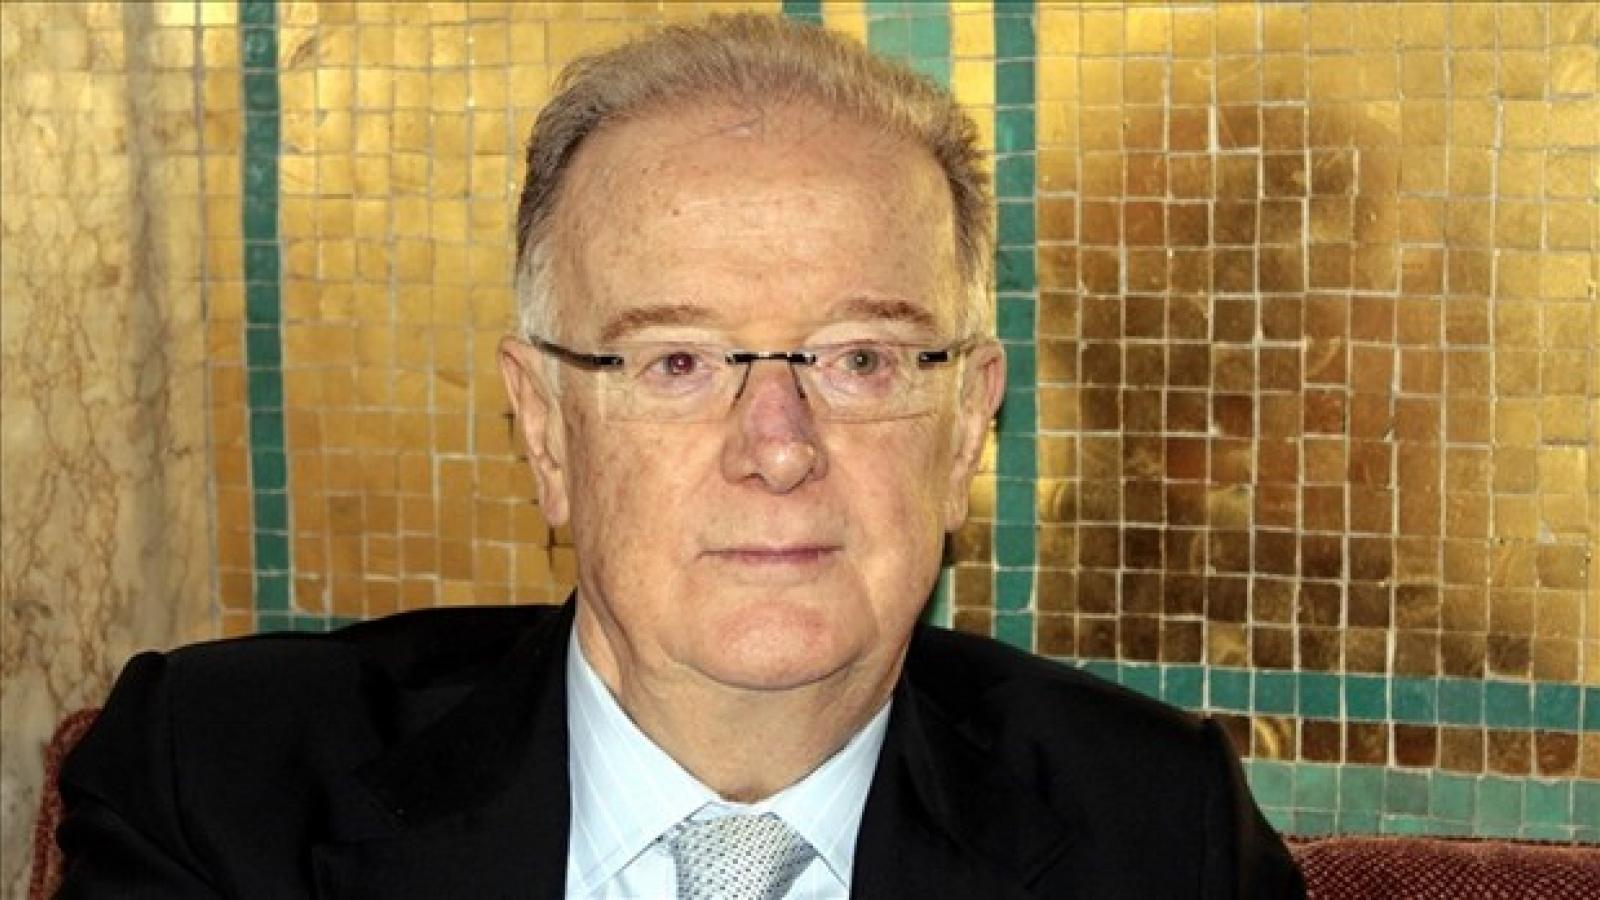 Condolences over former Portuguese president's passing